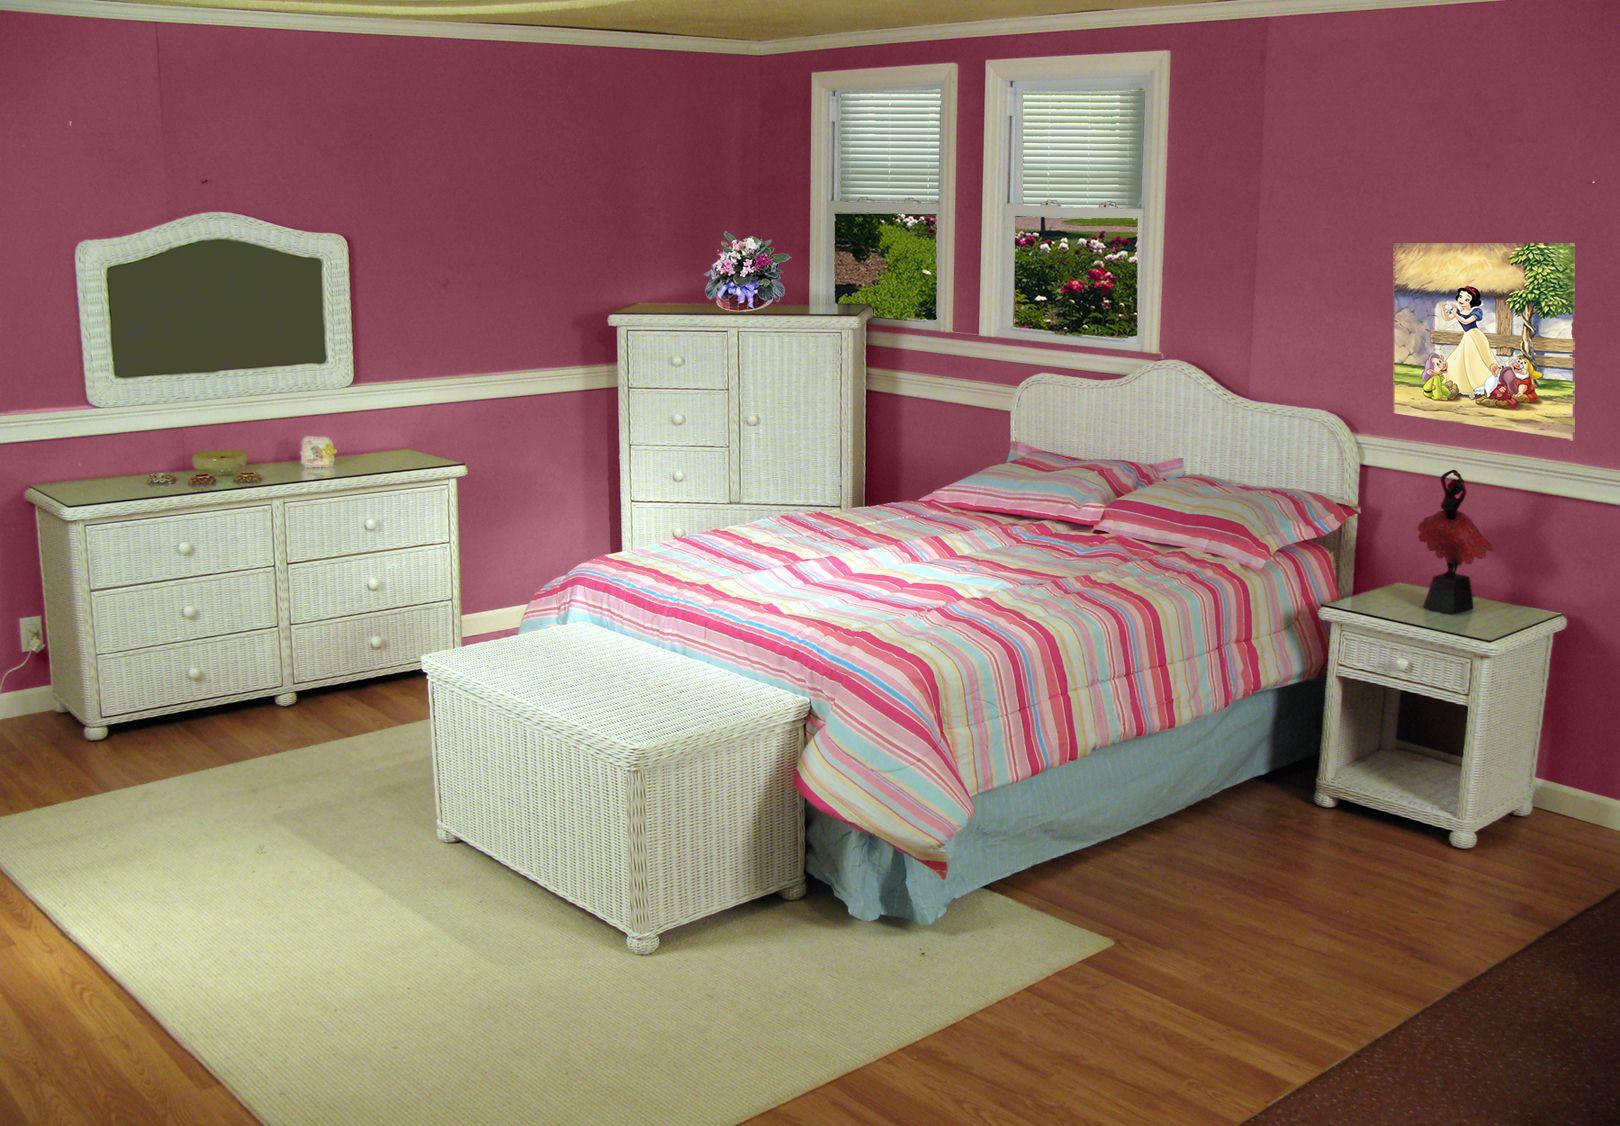 Bedroom Wicker Furniture Elana Classic Bedroom Set white